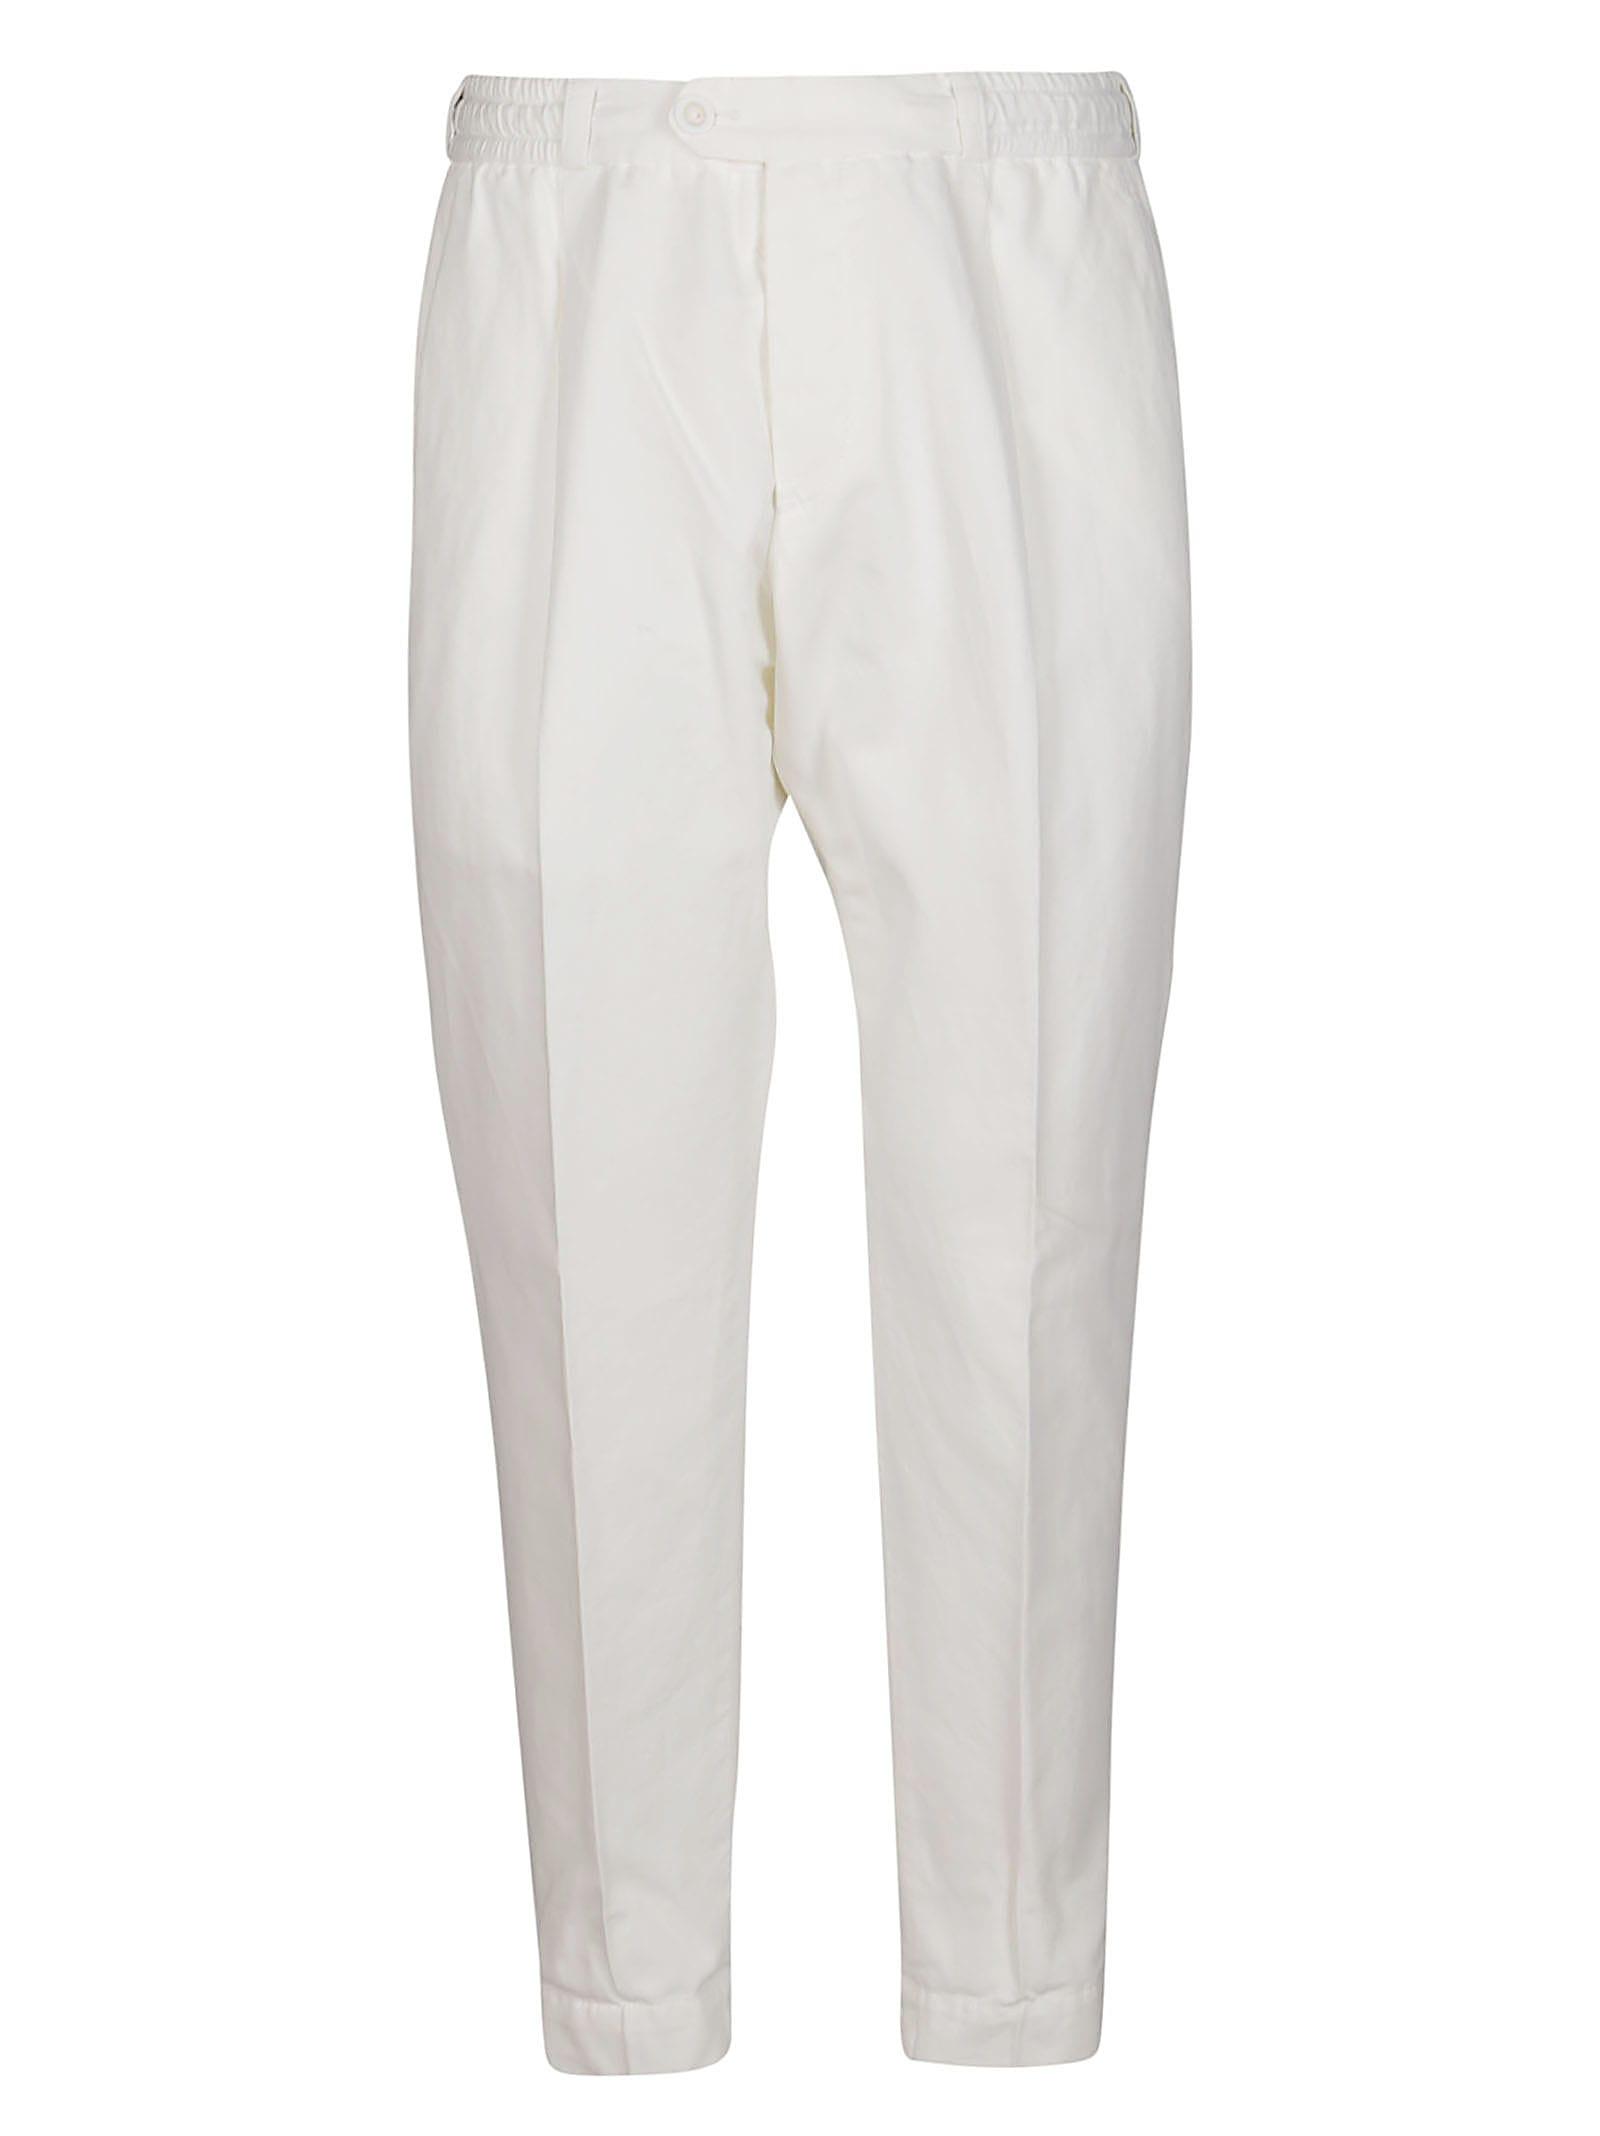 Pt01 Clothing WHITE COTTON-LINEN BLEND TROUSERS